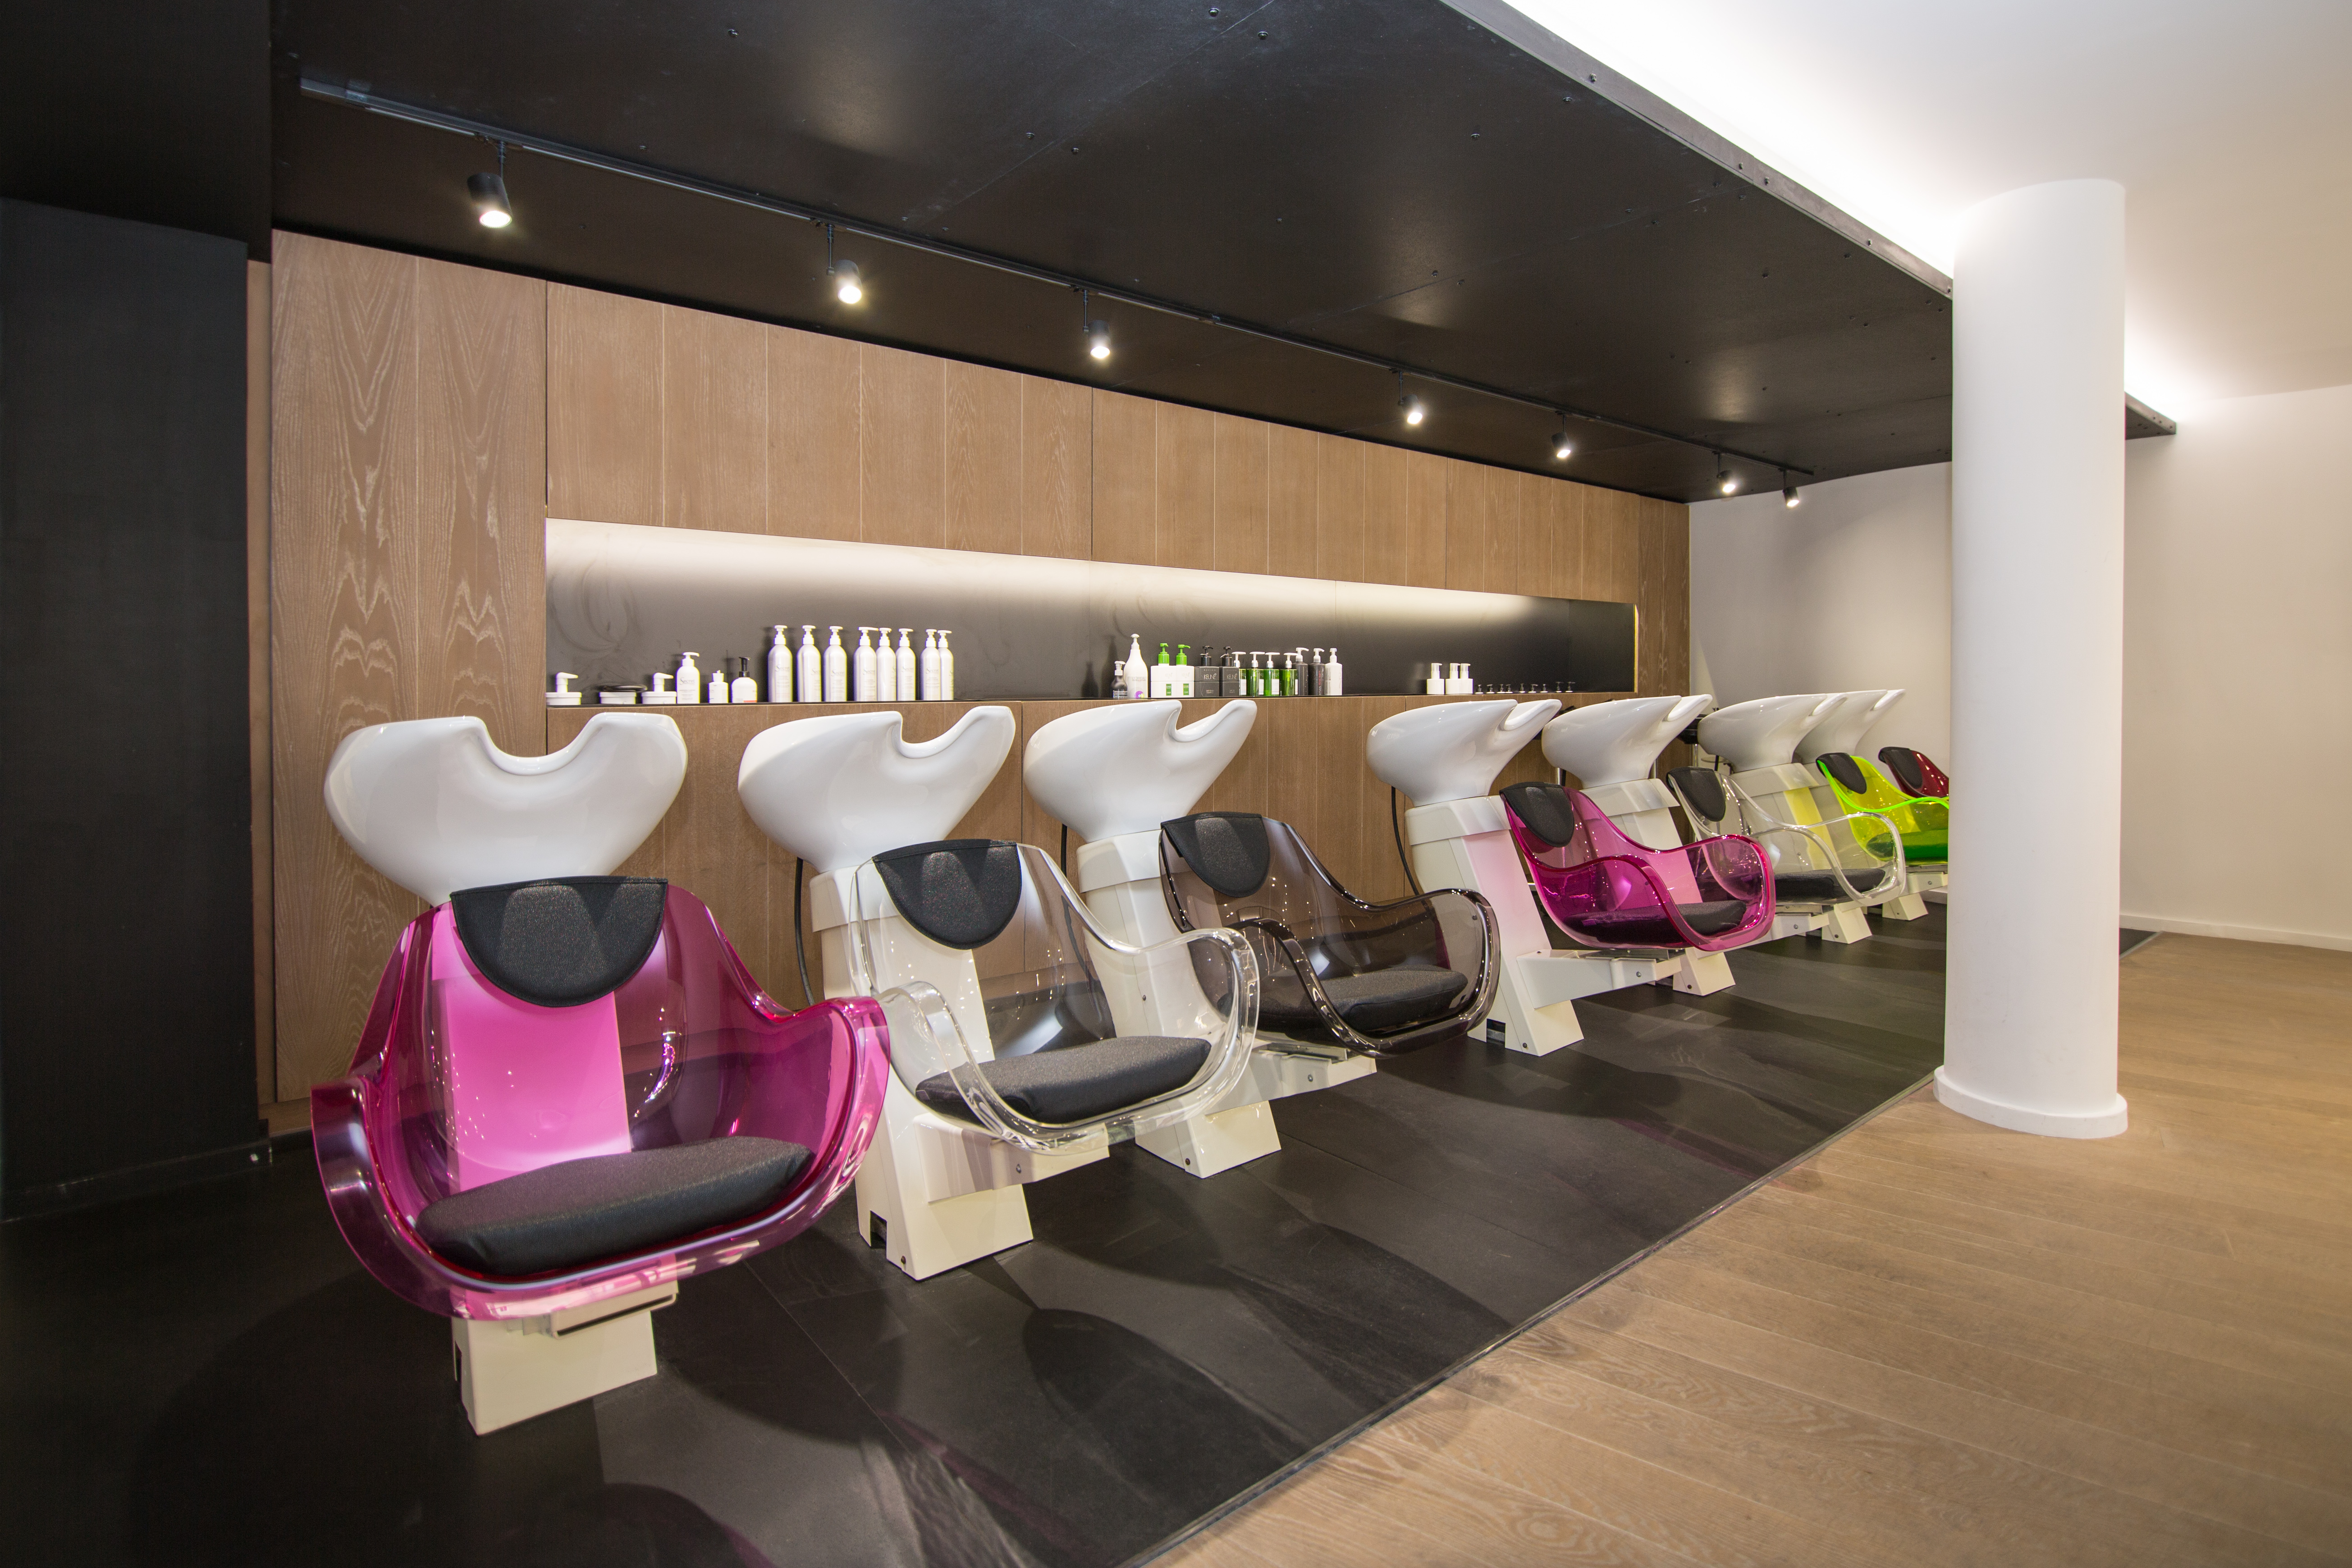 Le salon de coiffure m con tendance for Chip salon de coiffure